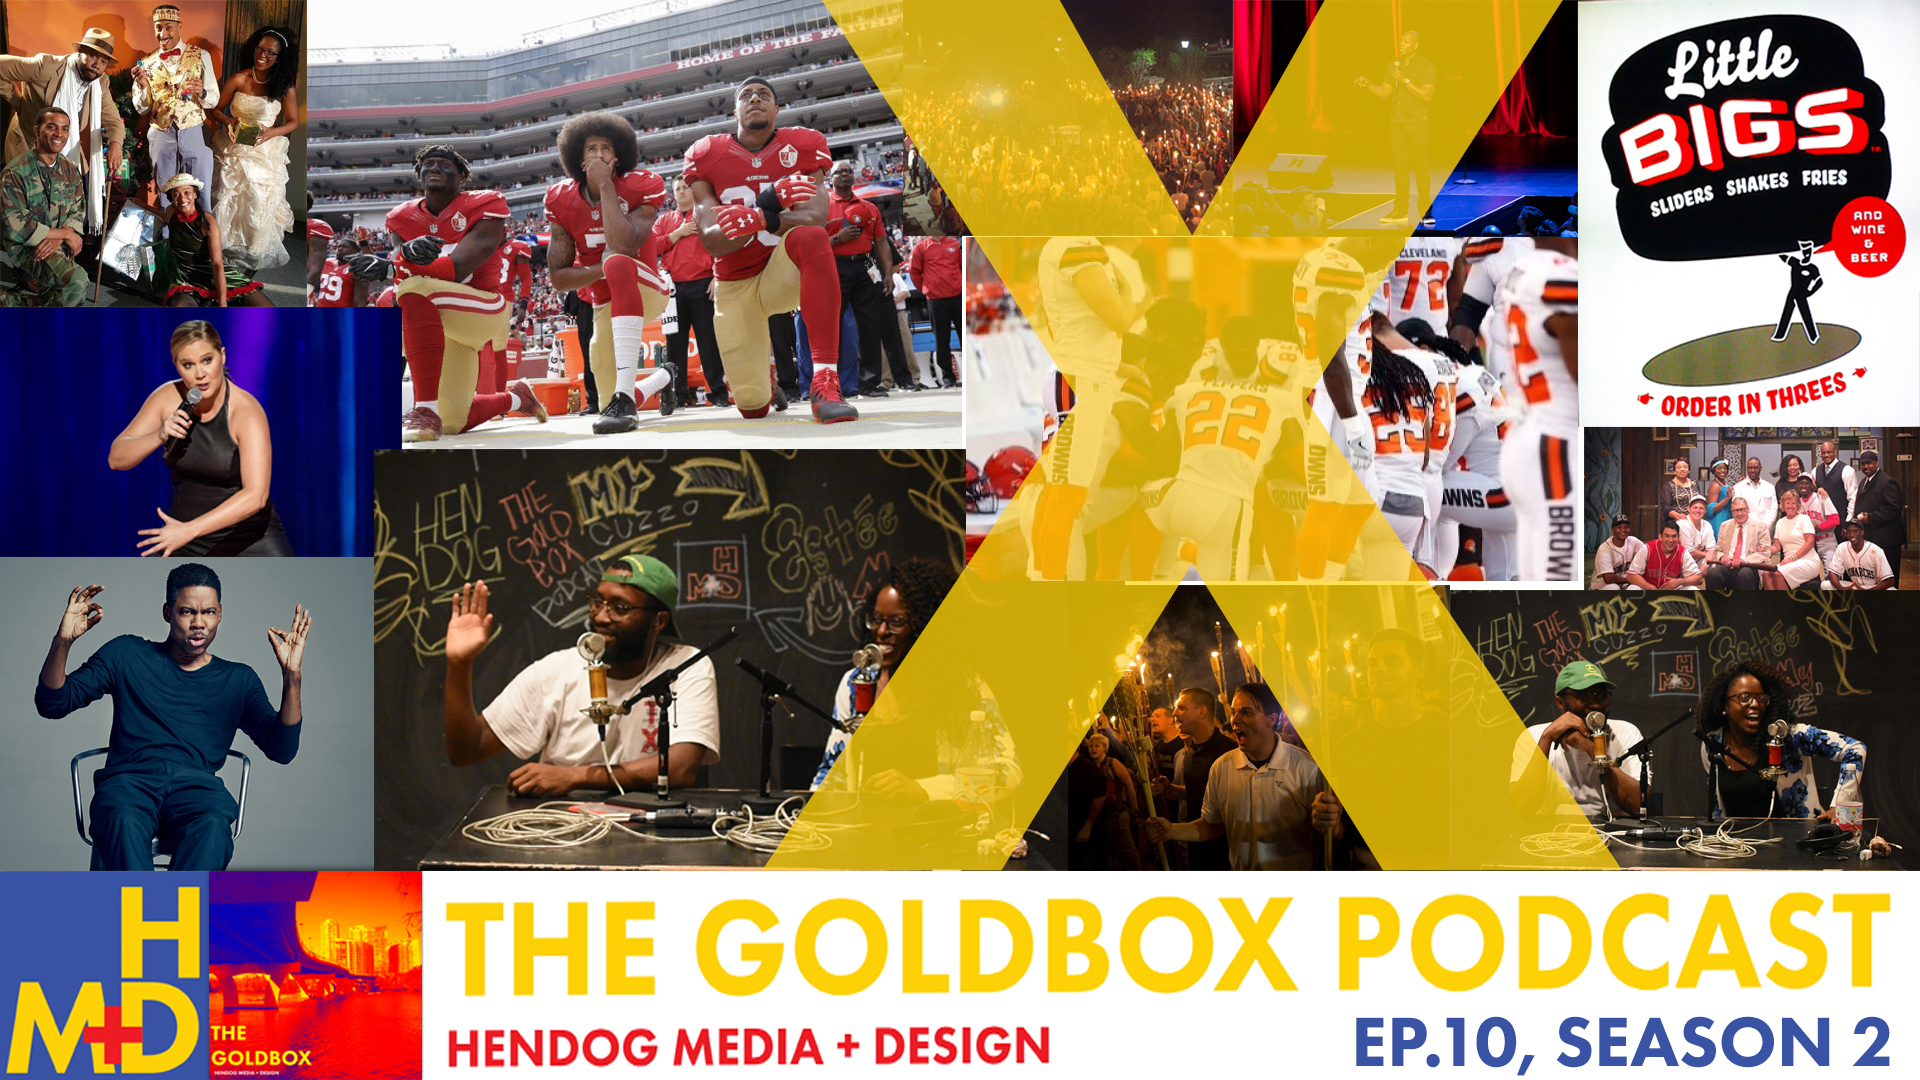 HDMD THE GOLDBOX Podcast Thumbnail v 2.0-10.jpg